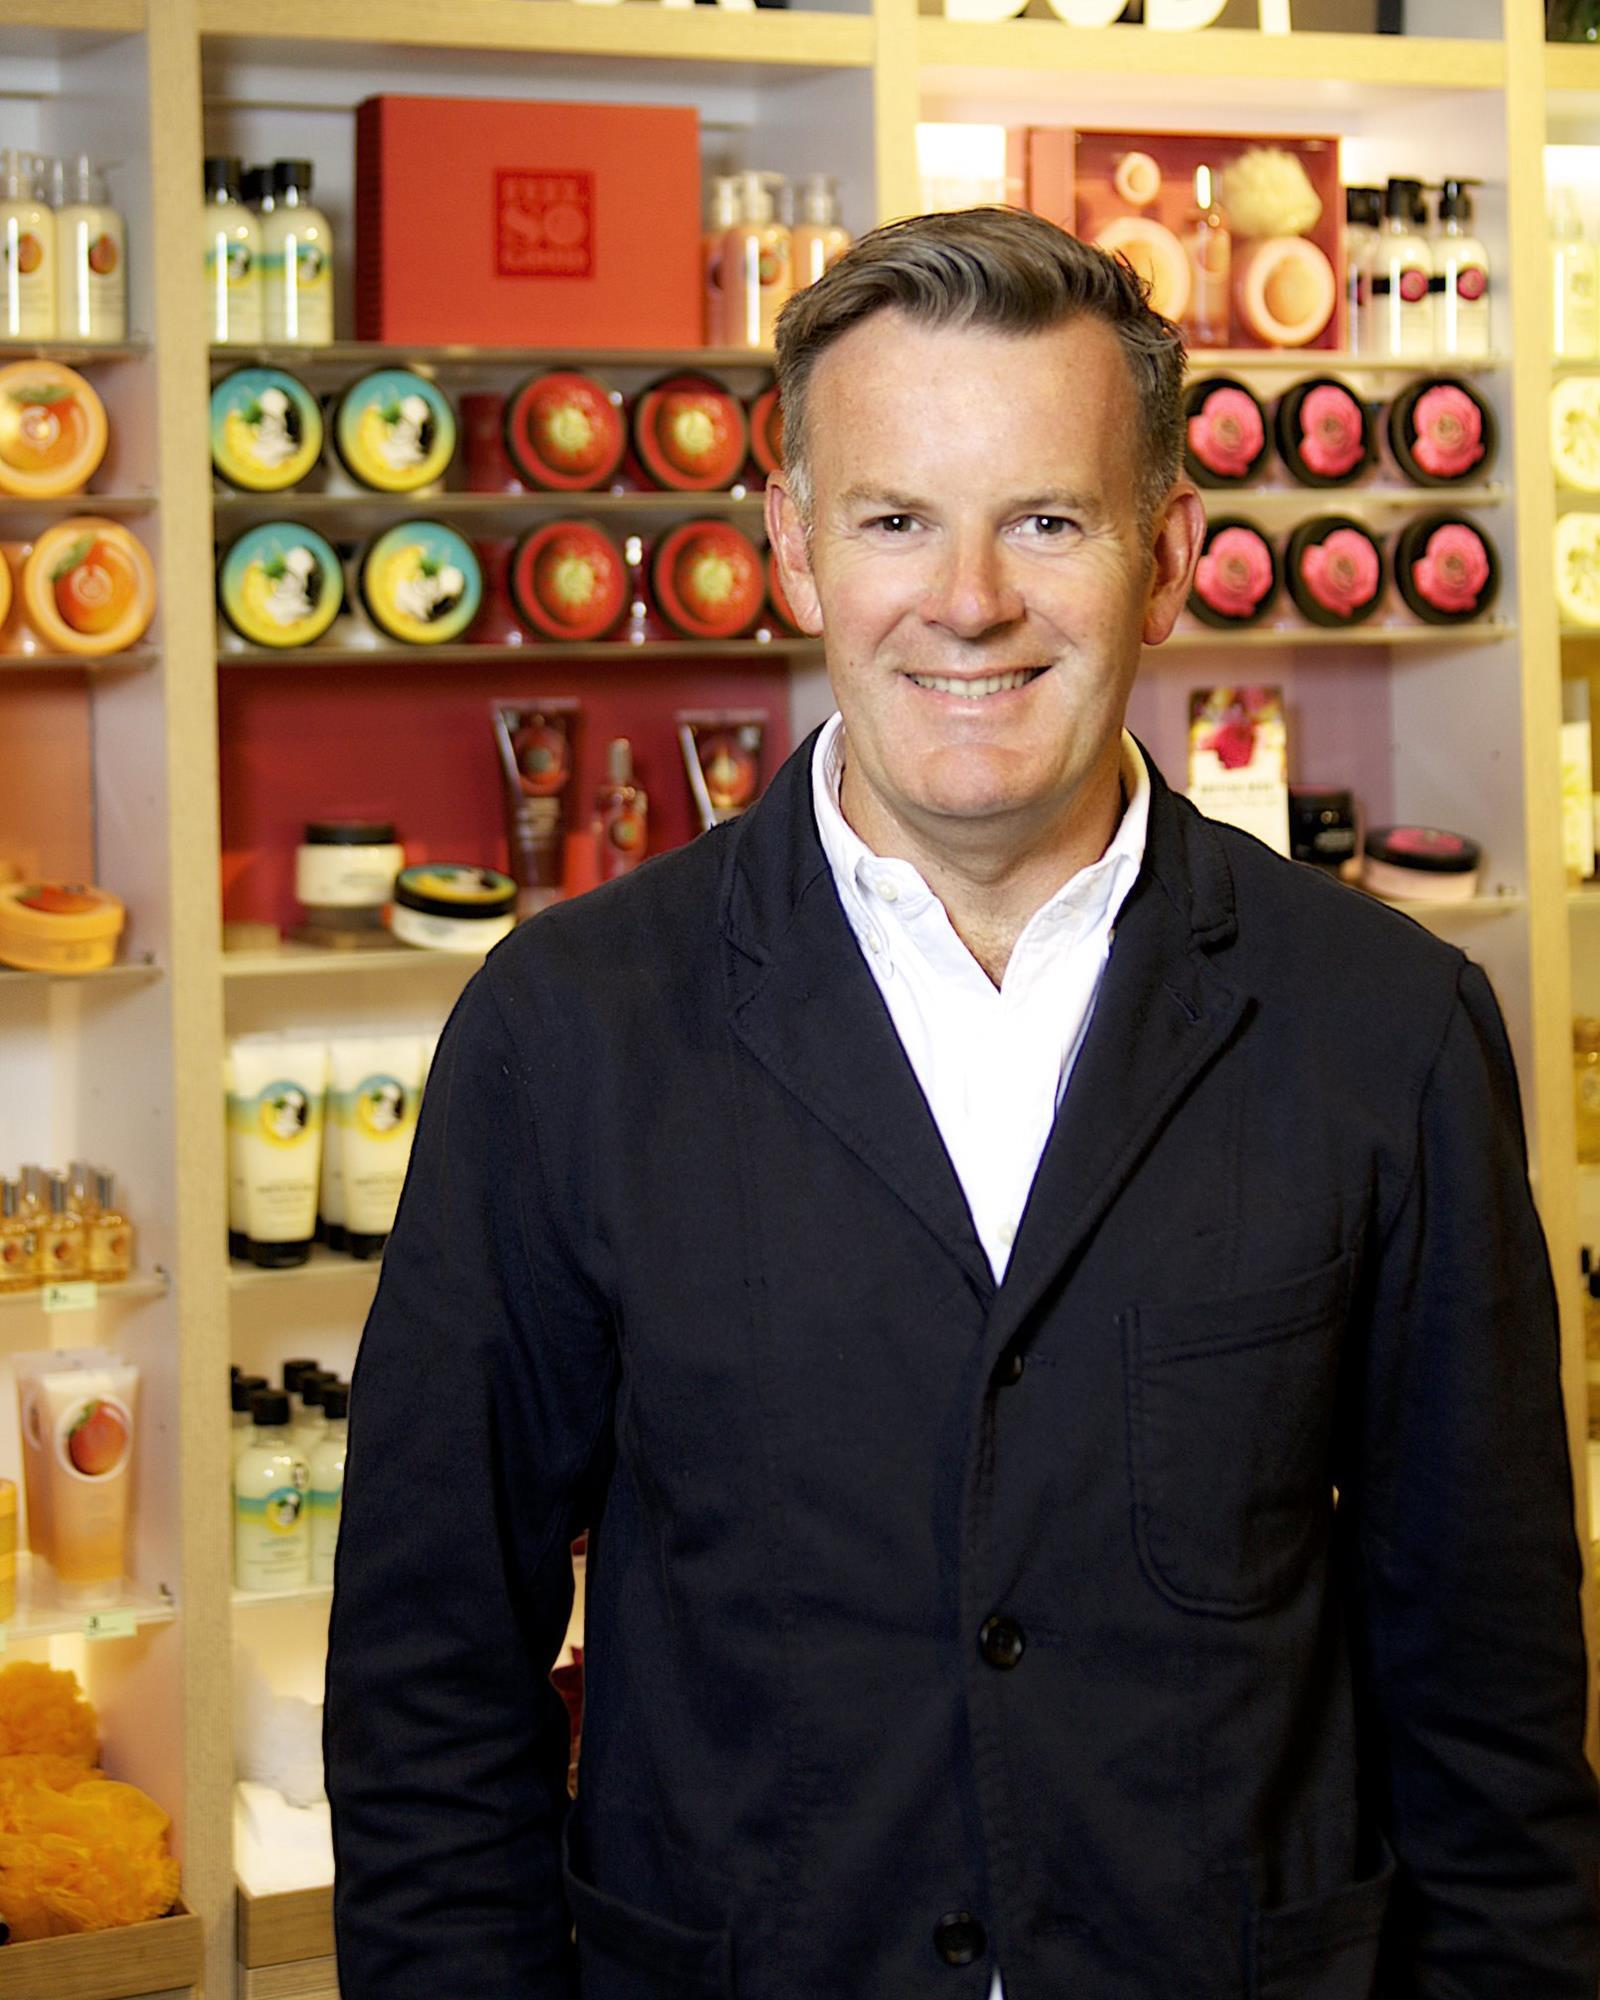 The Body Shop Names New UK Boss Amid Shake-up